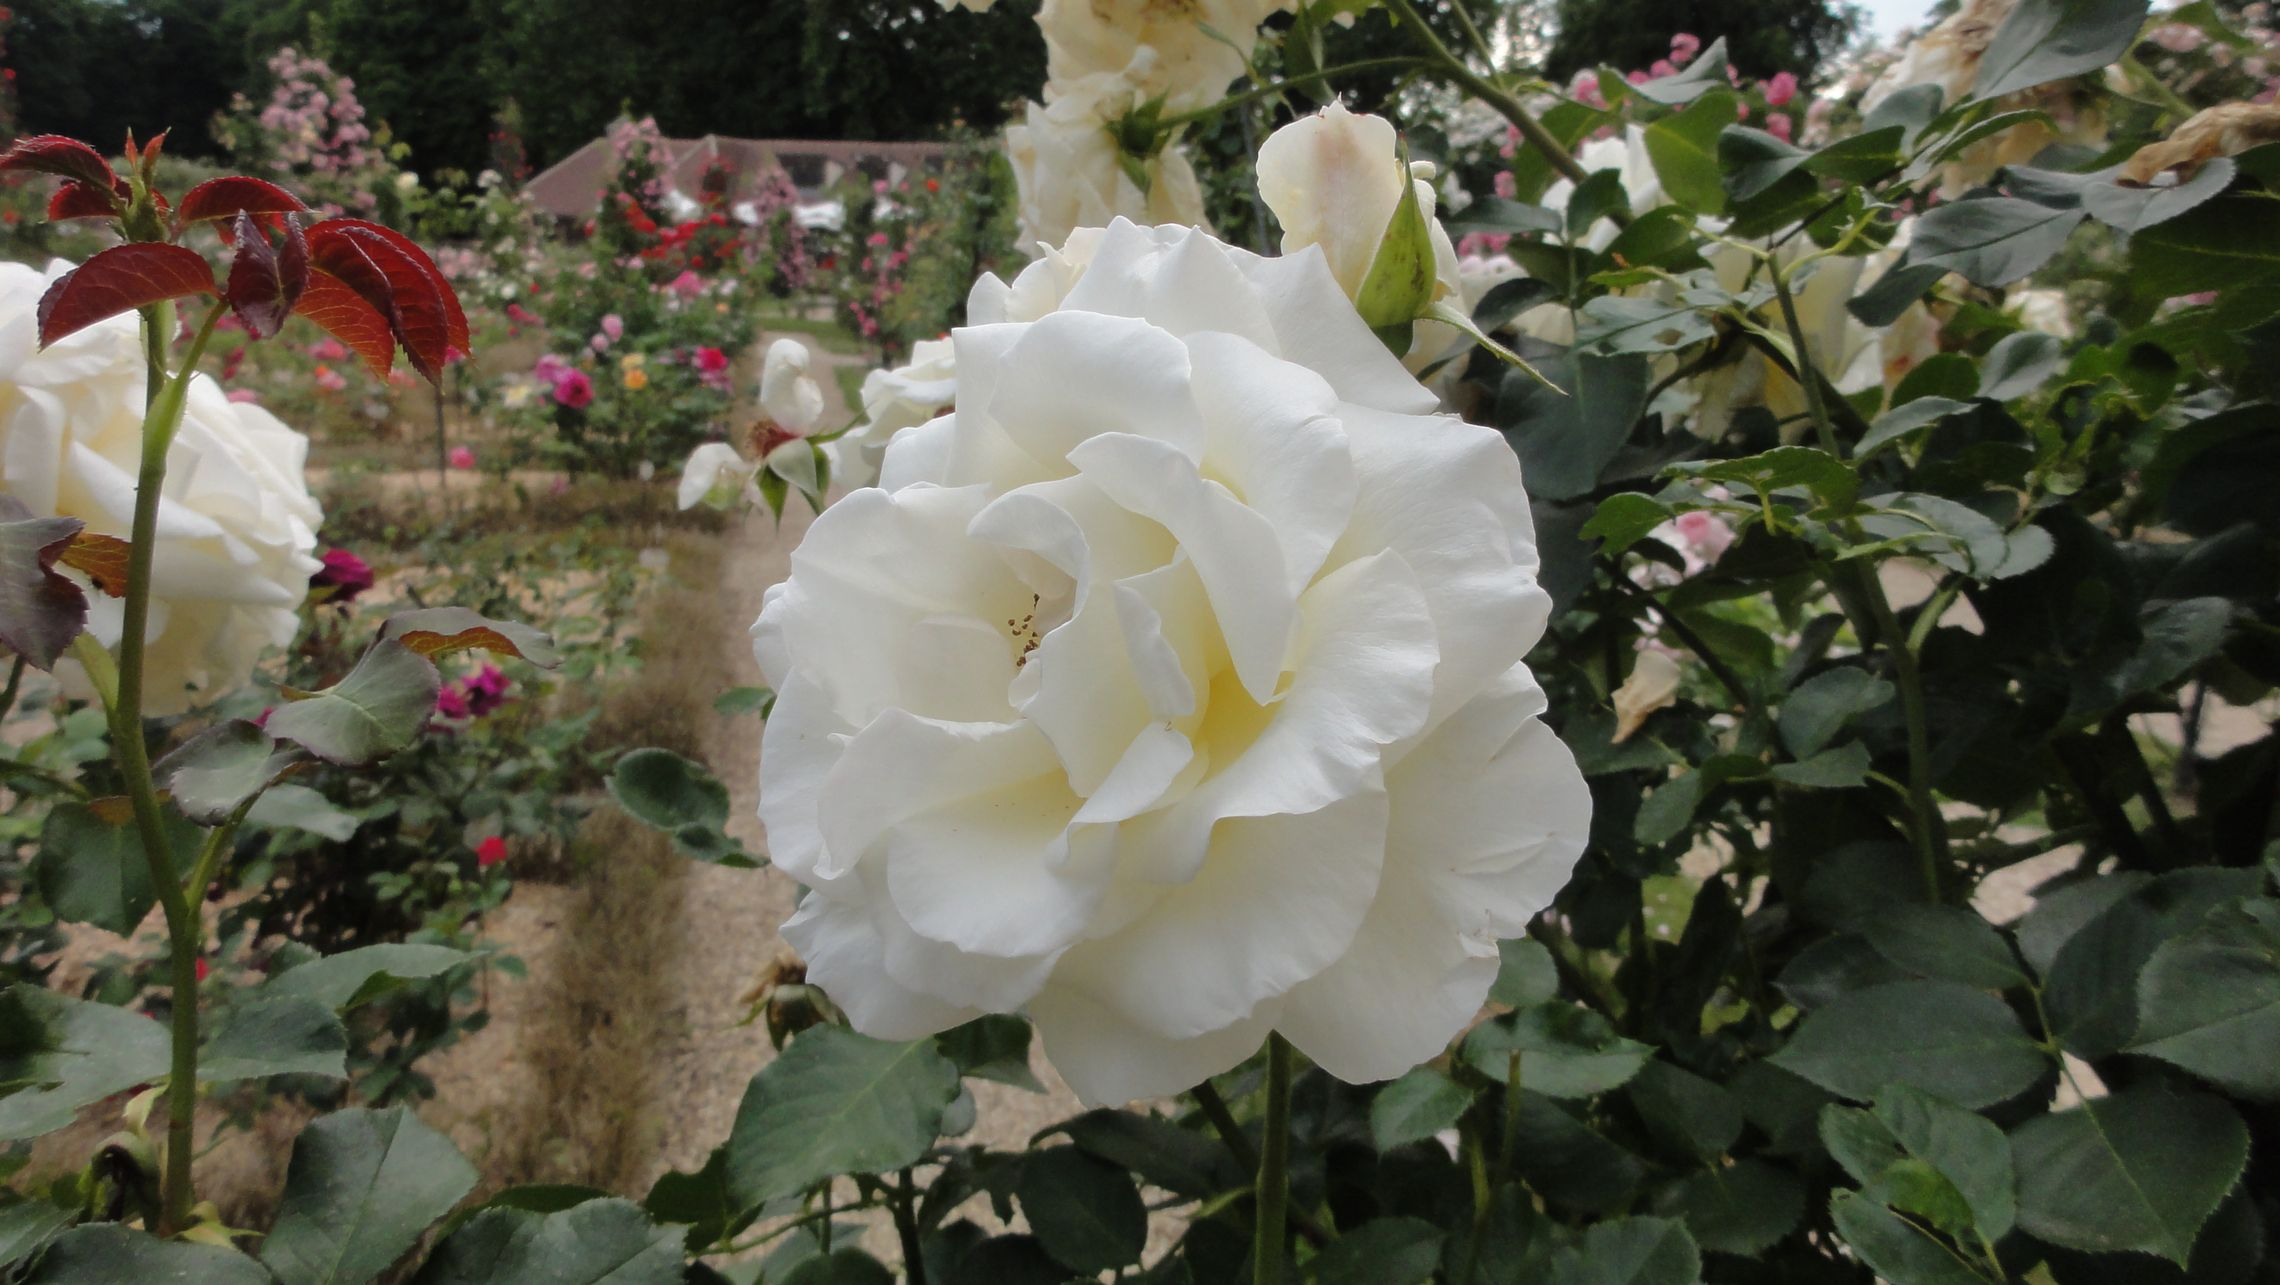 20170602 roseraie vdm 12